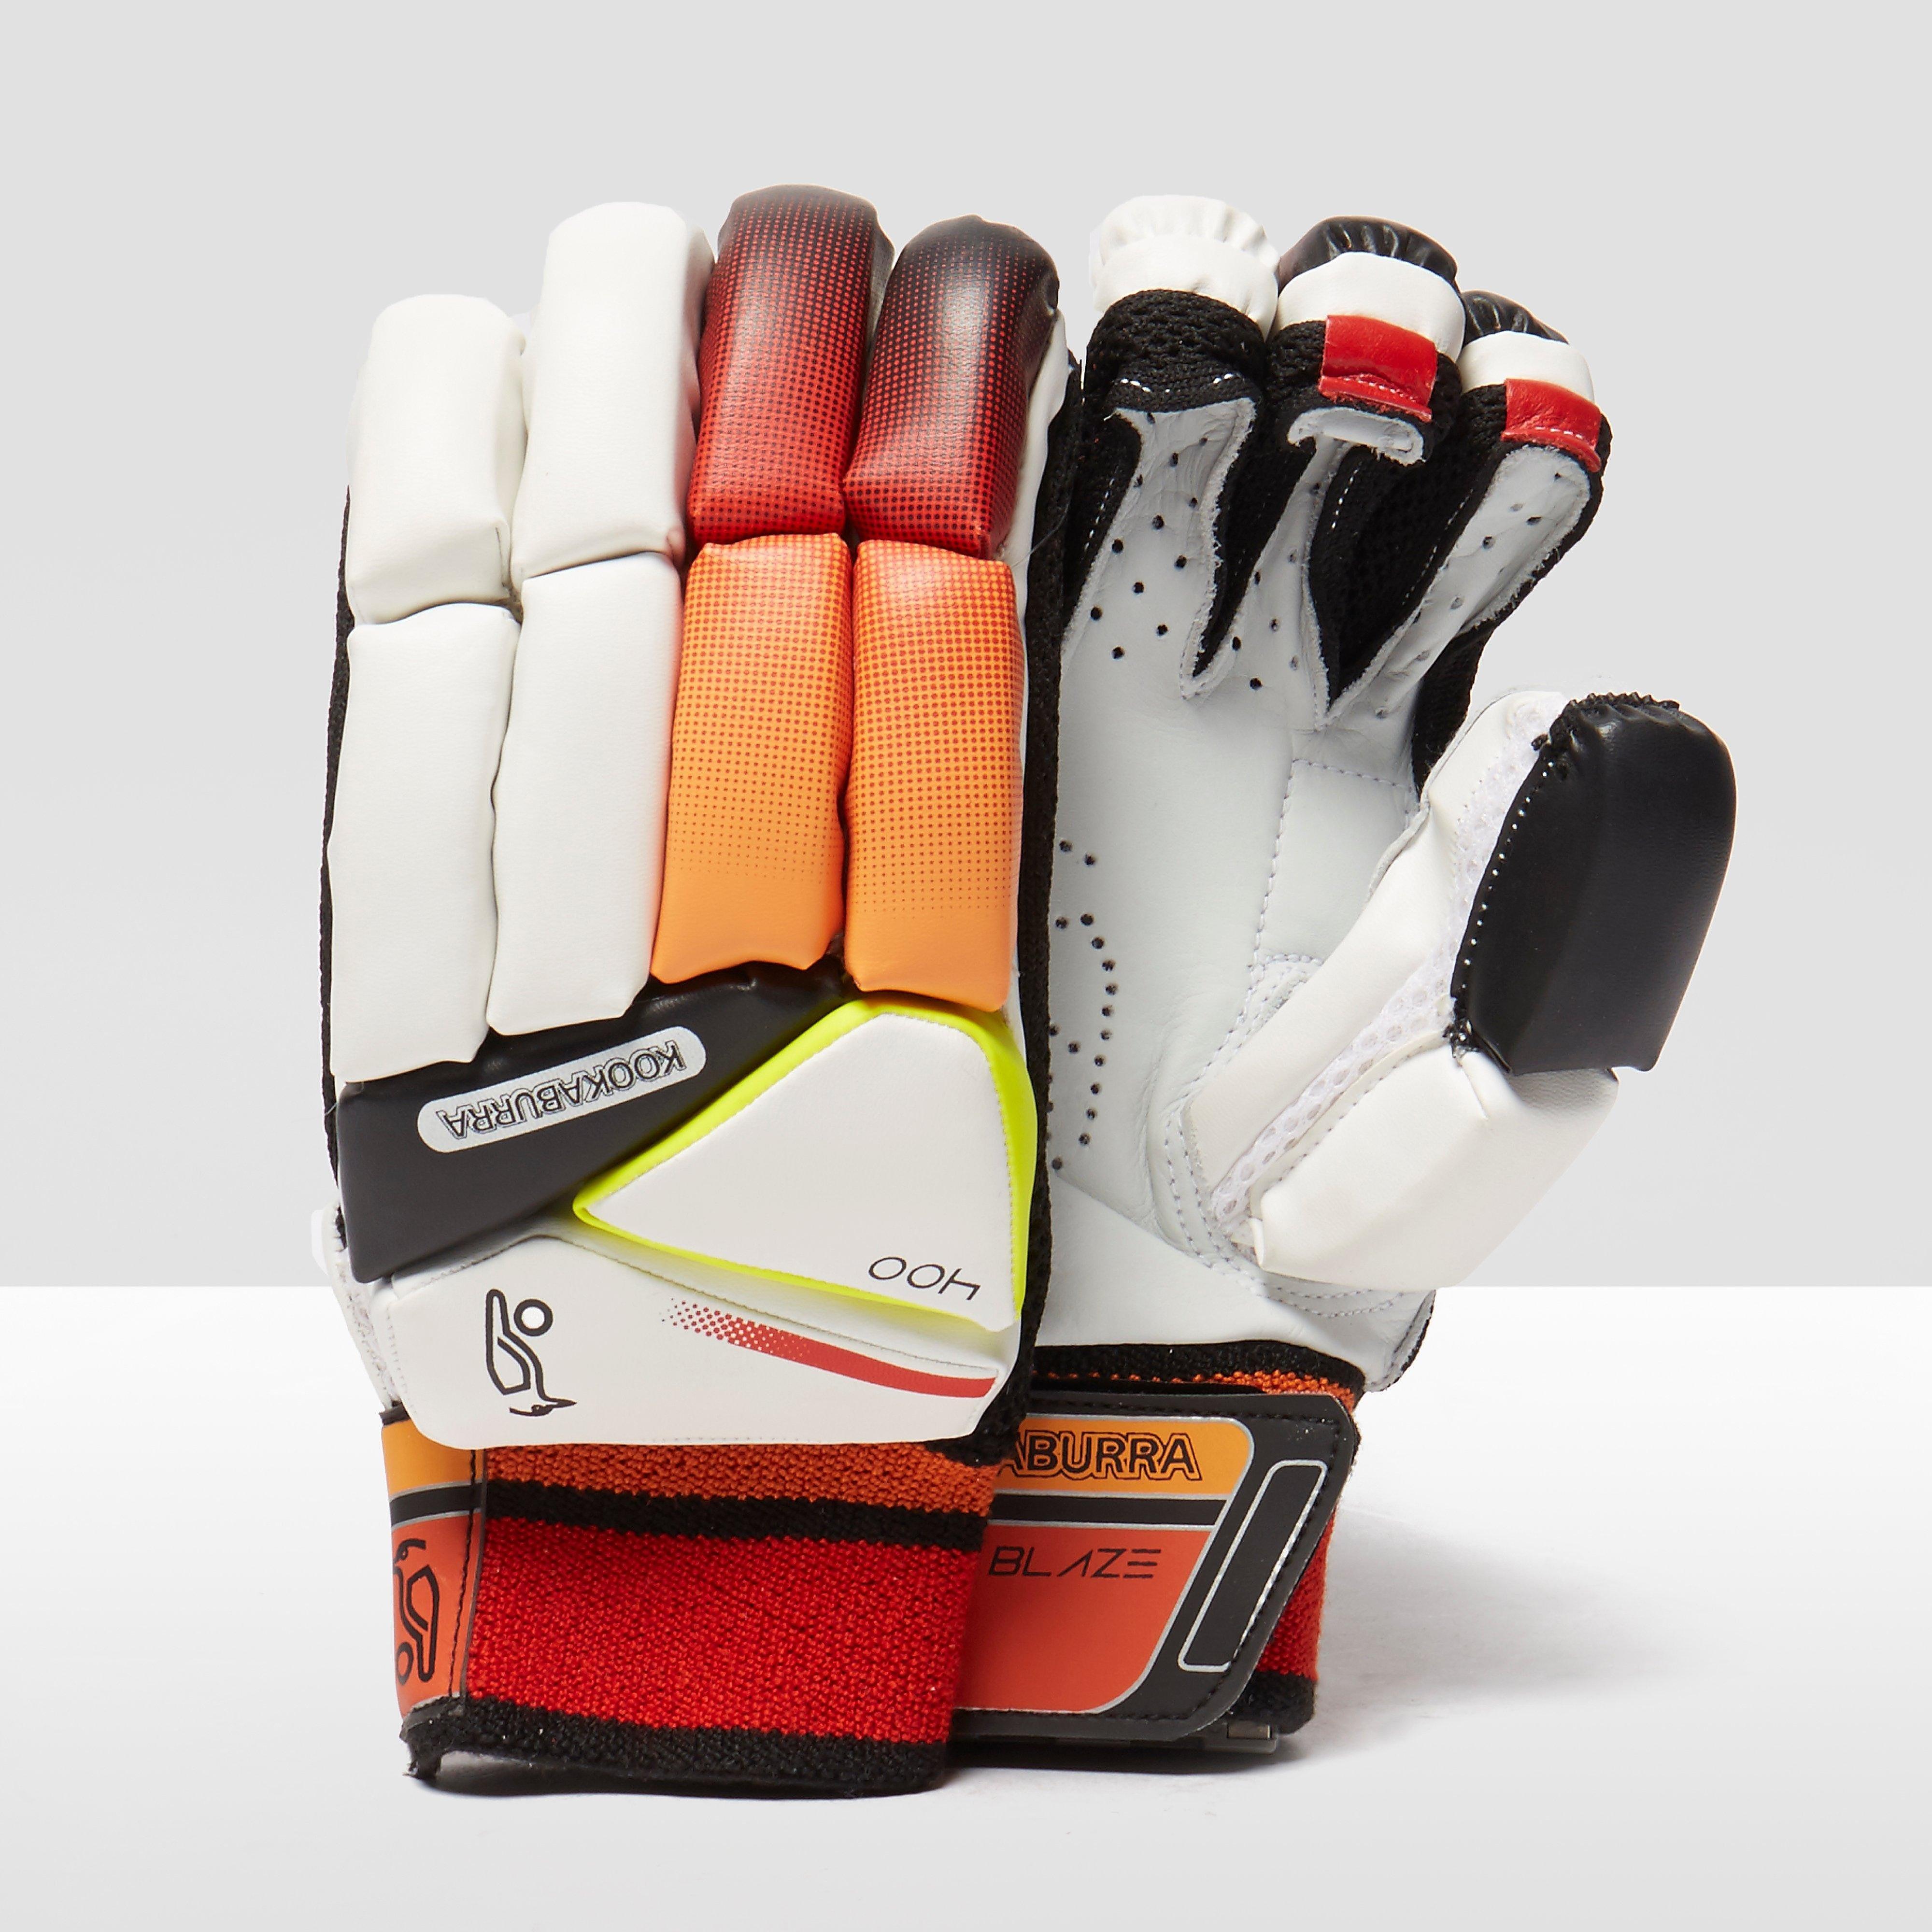 Kookaburra Blaze 400 Junior Batting Gloves